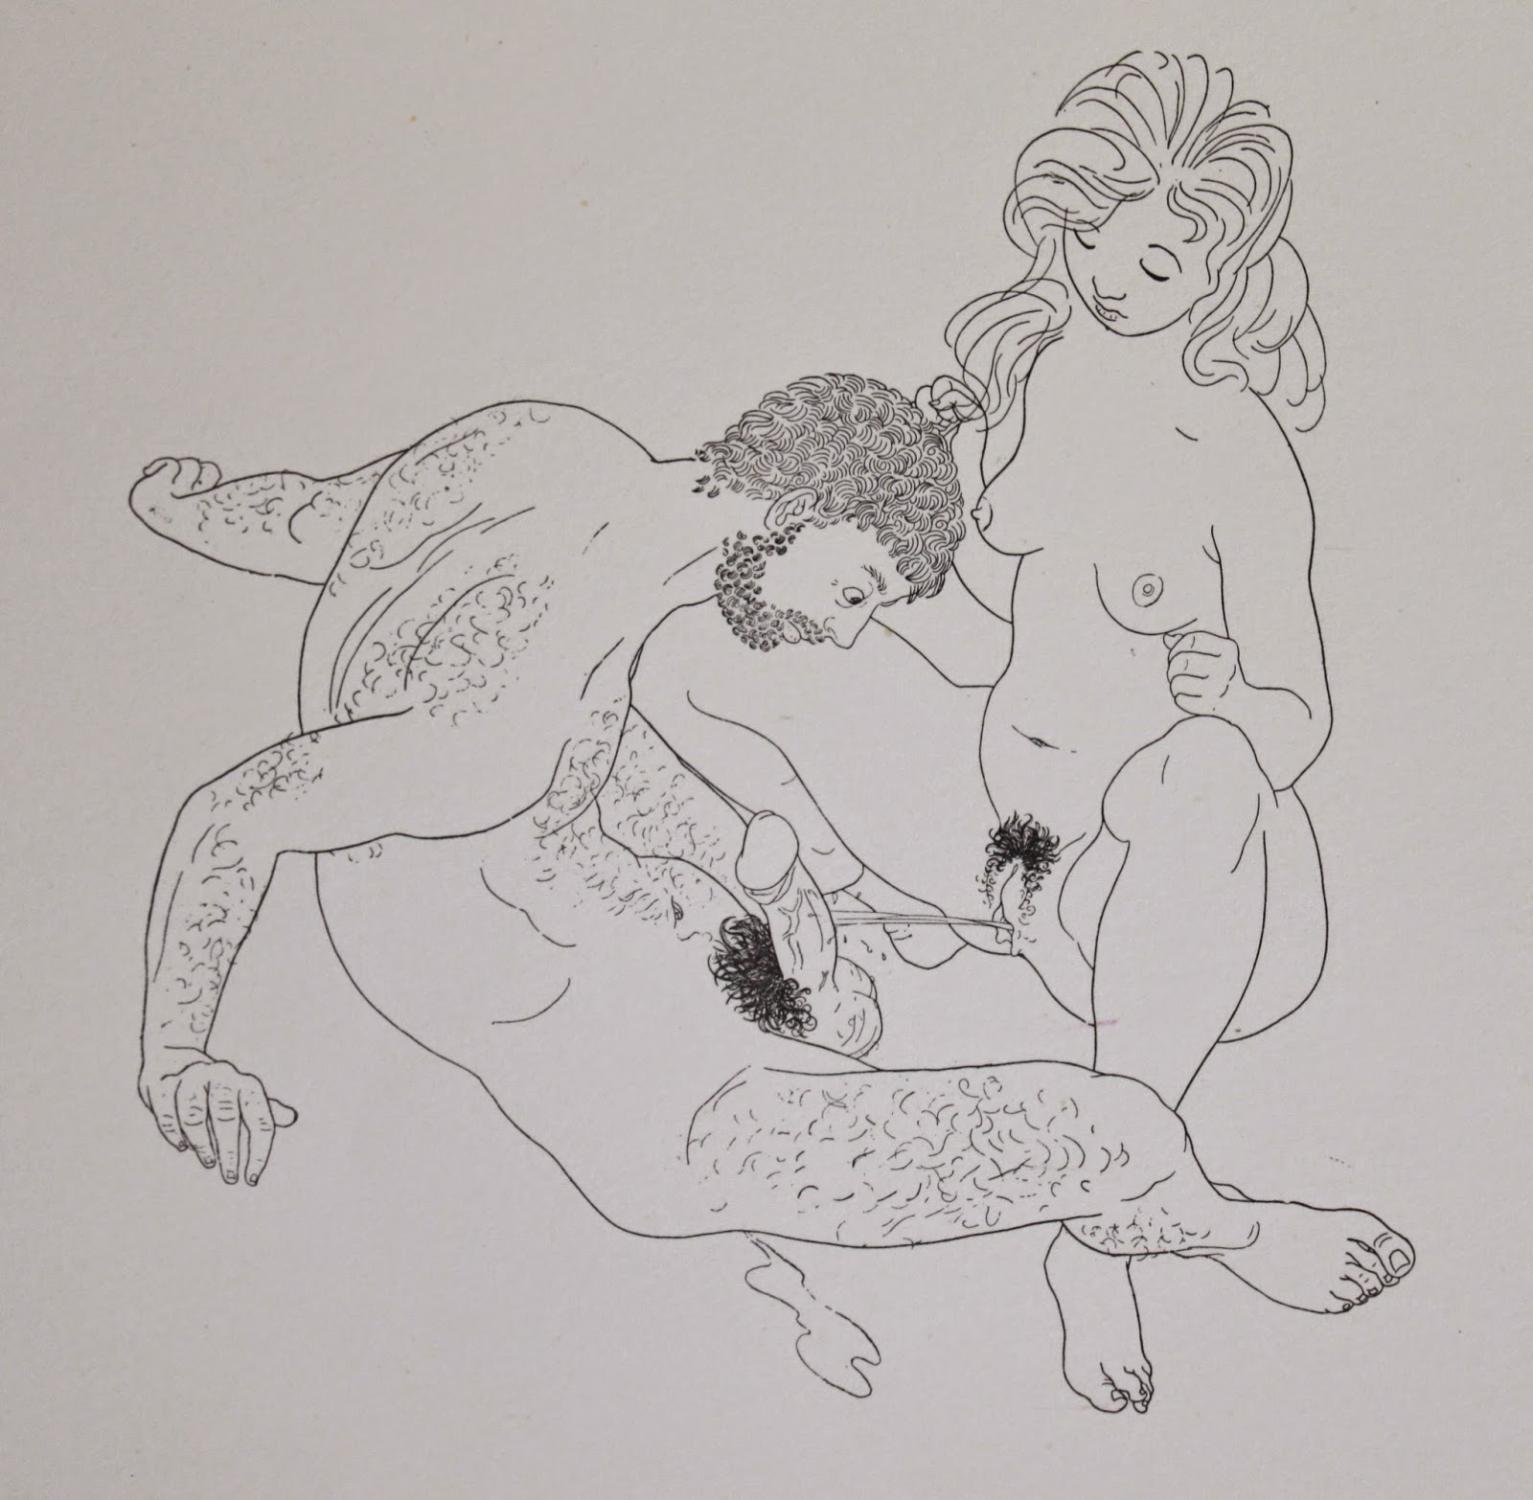 Erotica avec un groupe de brillant